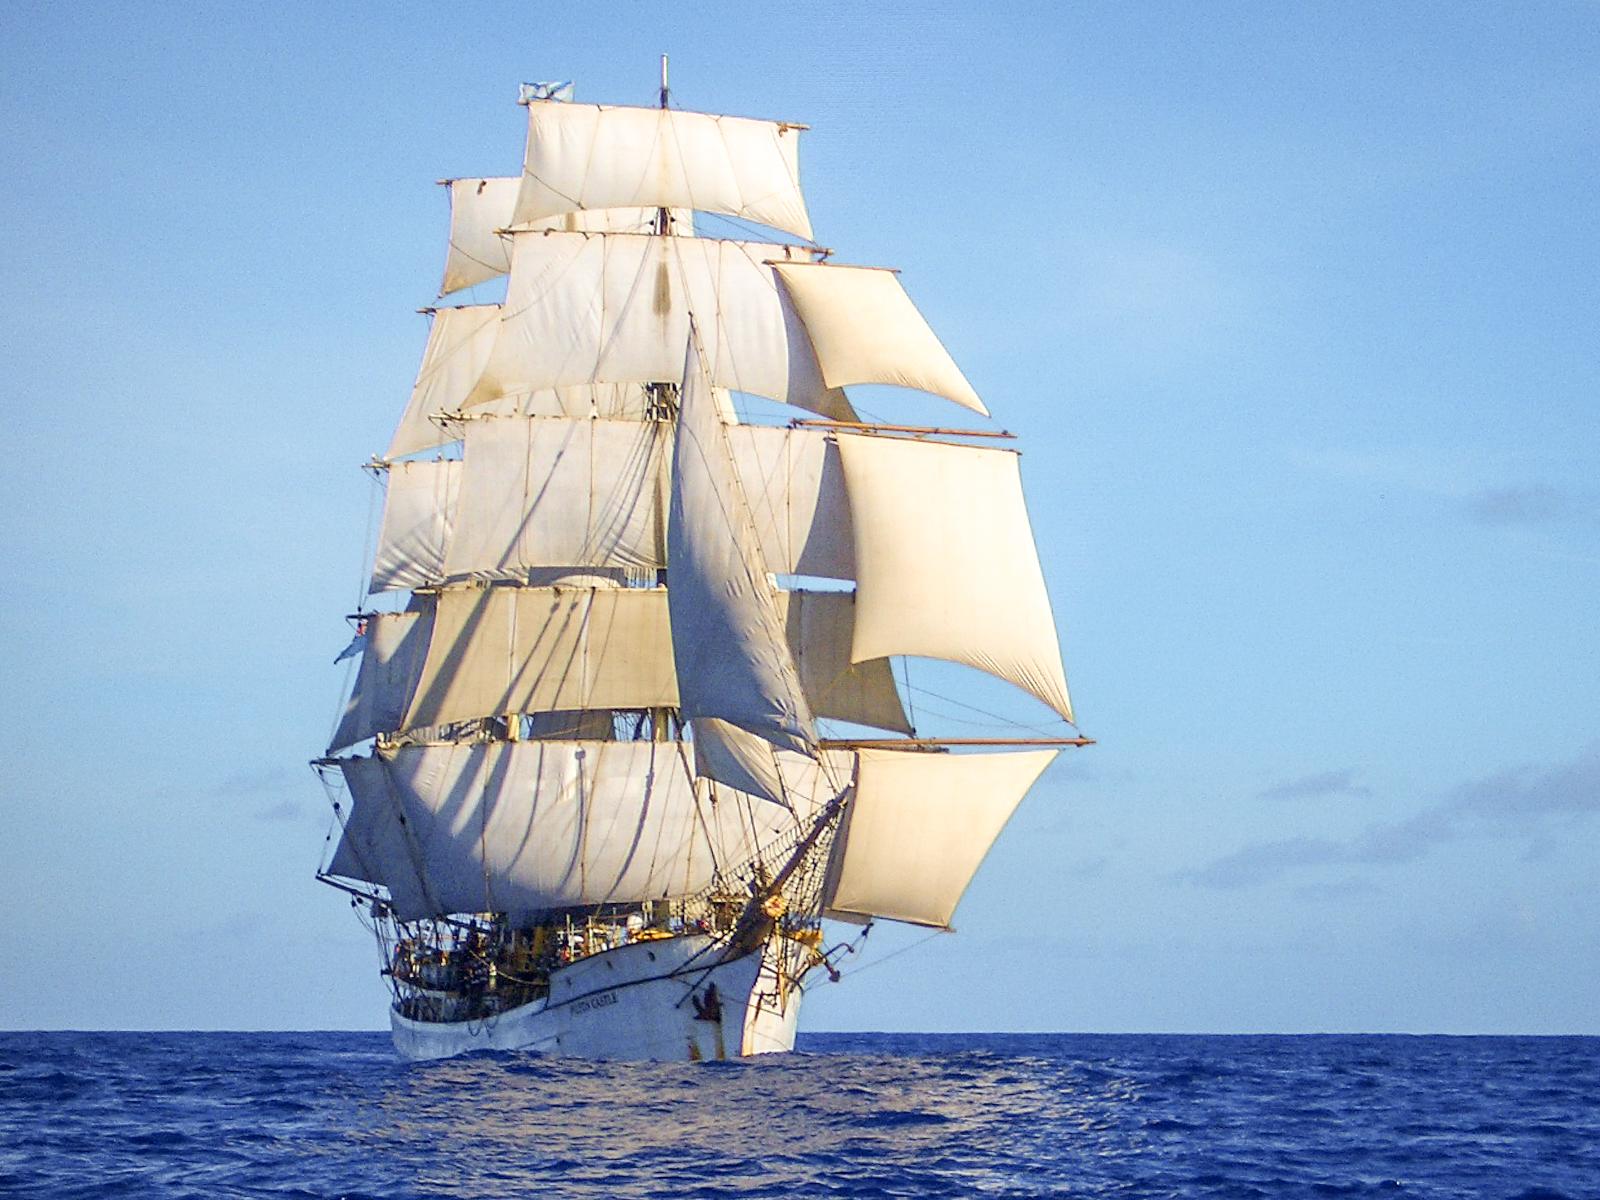 Tall ship photo